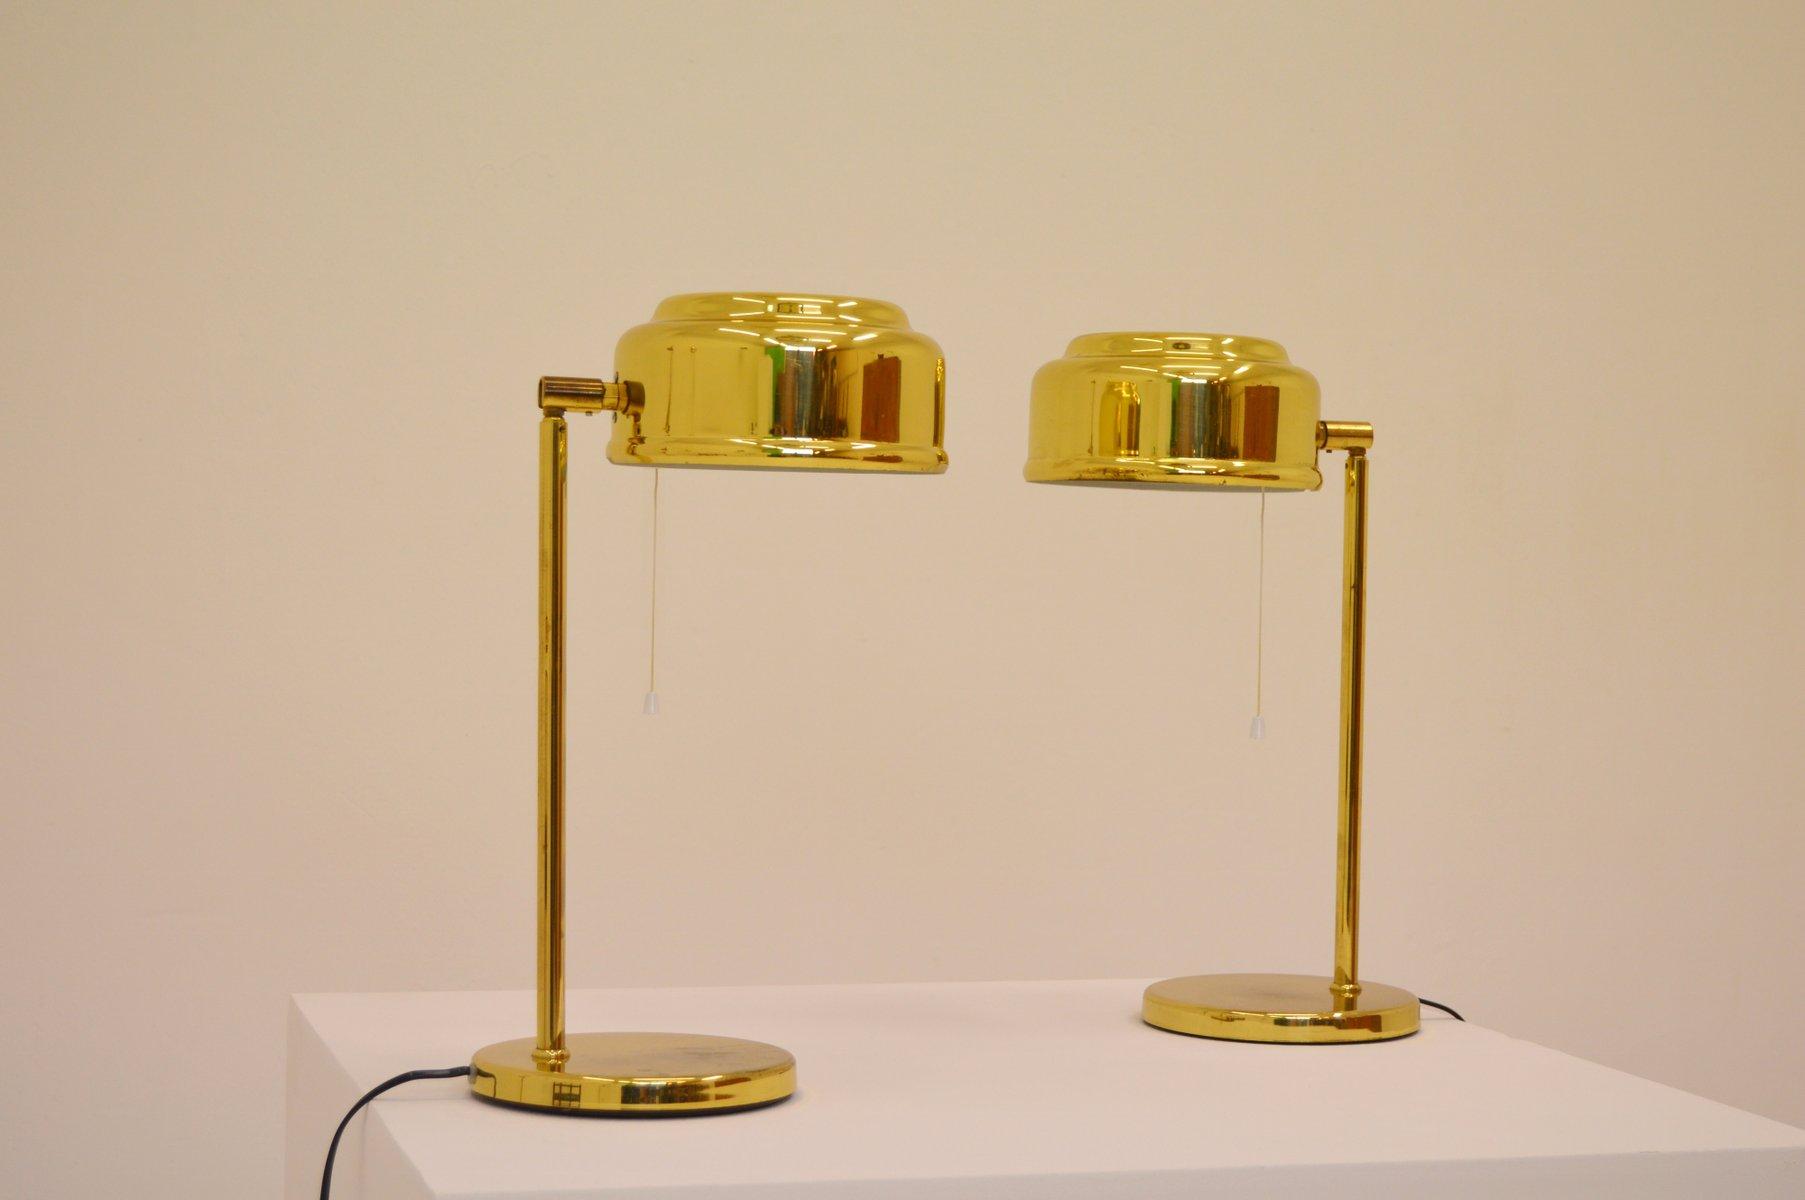 Lampade da tavolo moderne in ottone, Scandinavia, anni \'60, set di 2 ...